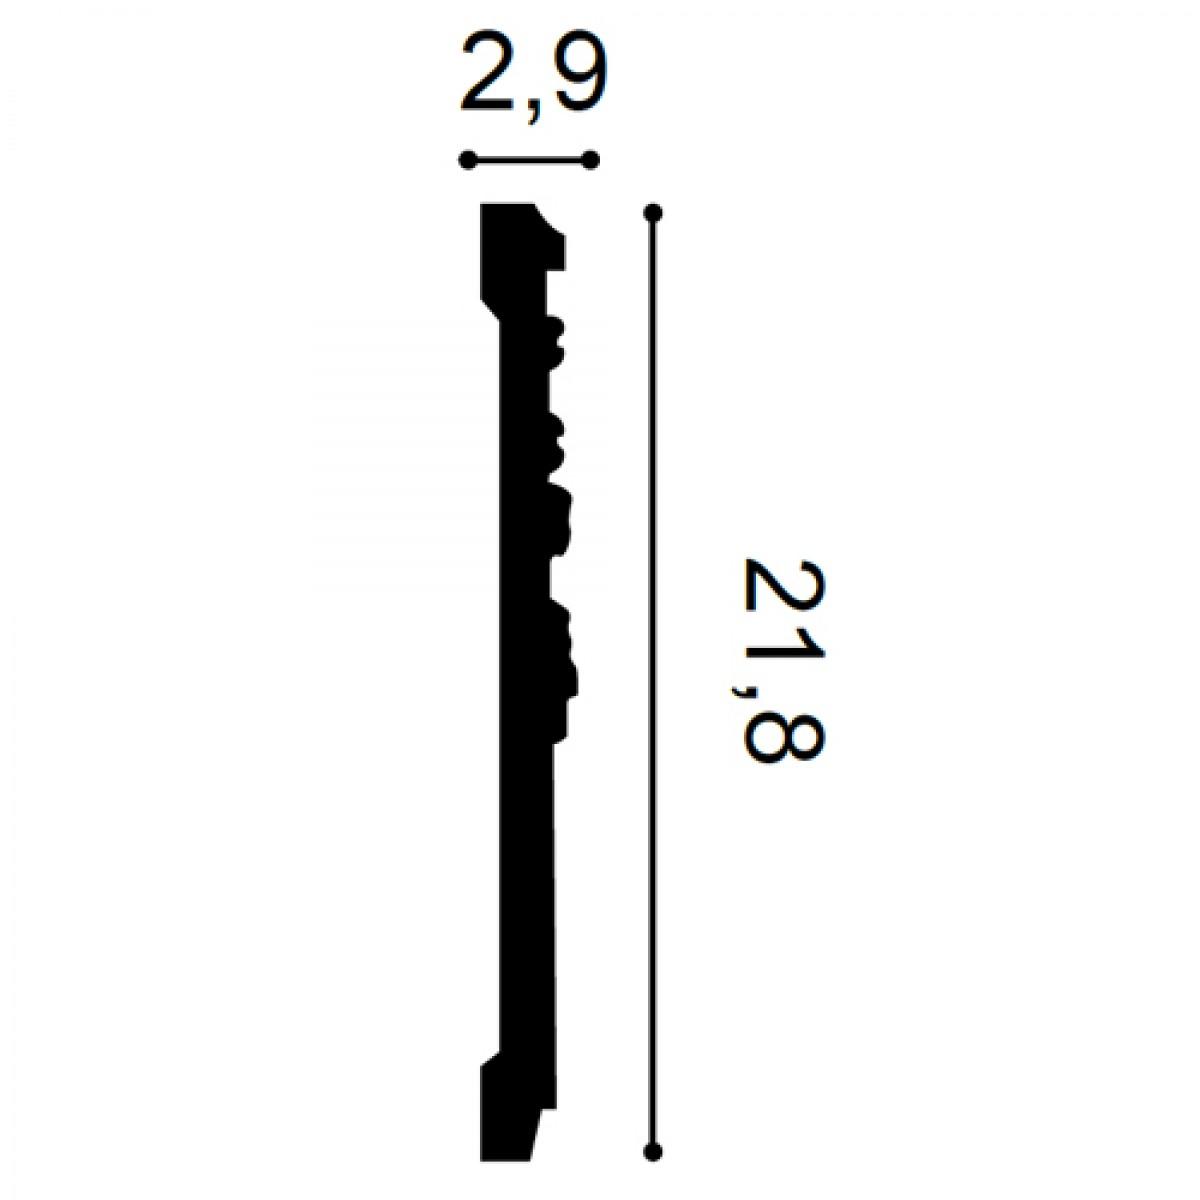 Brau Luxxus P7080, Dimensiuni: 200 X 21.8 X 2.9 cm, Orac Decor